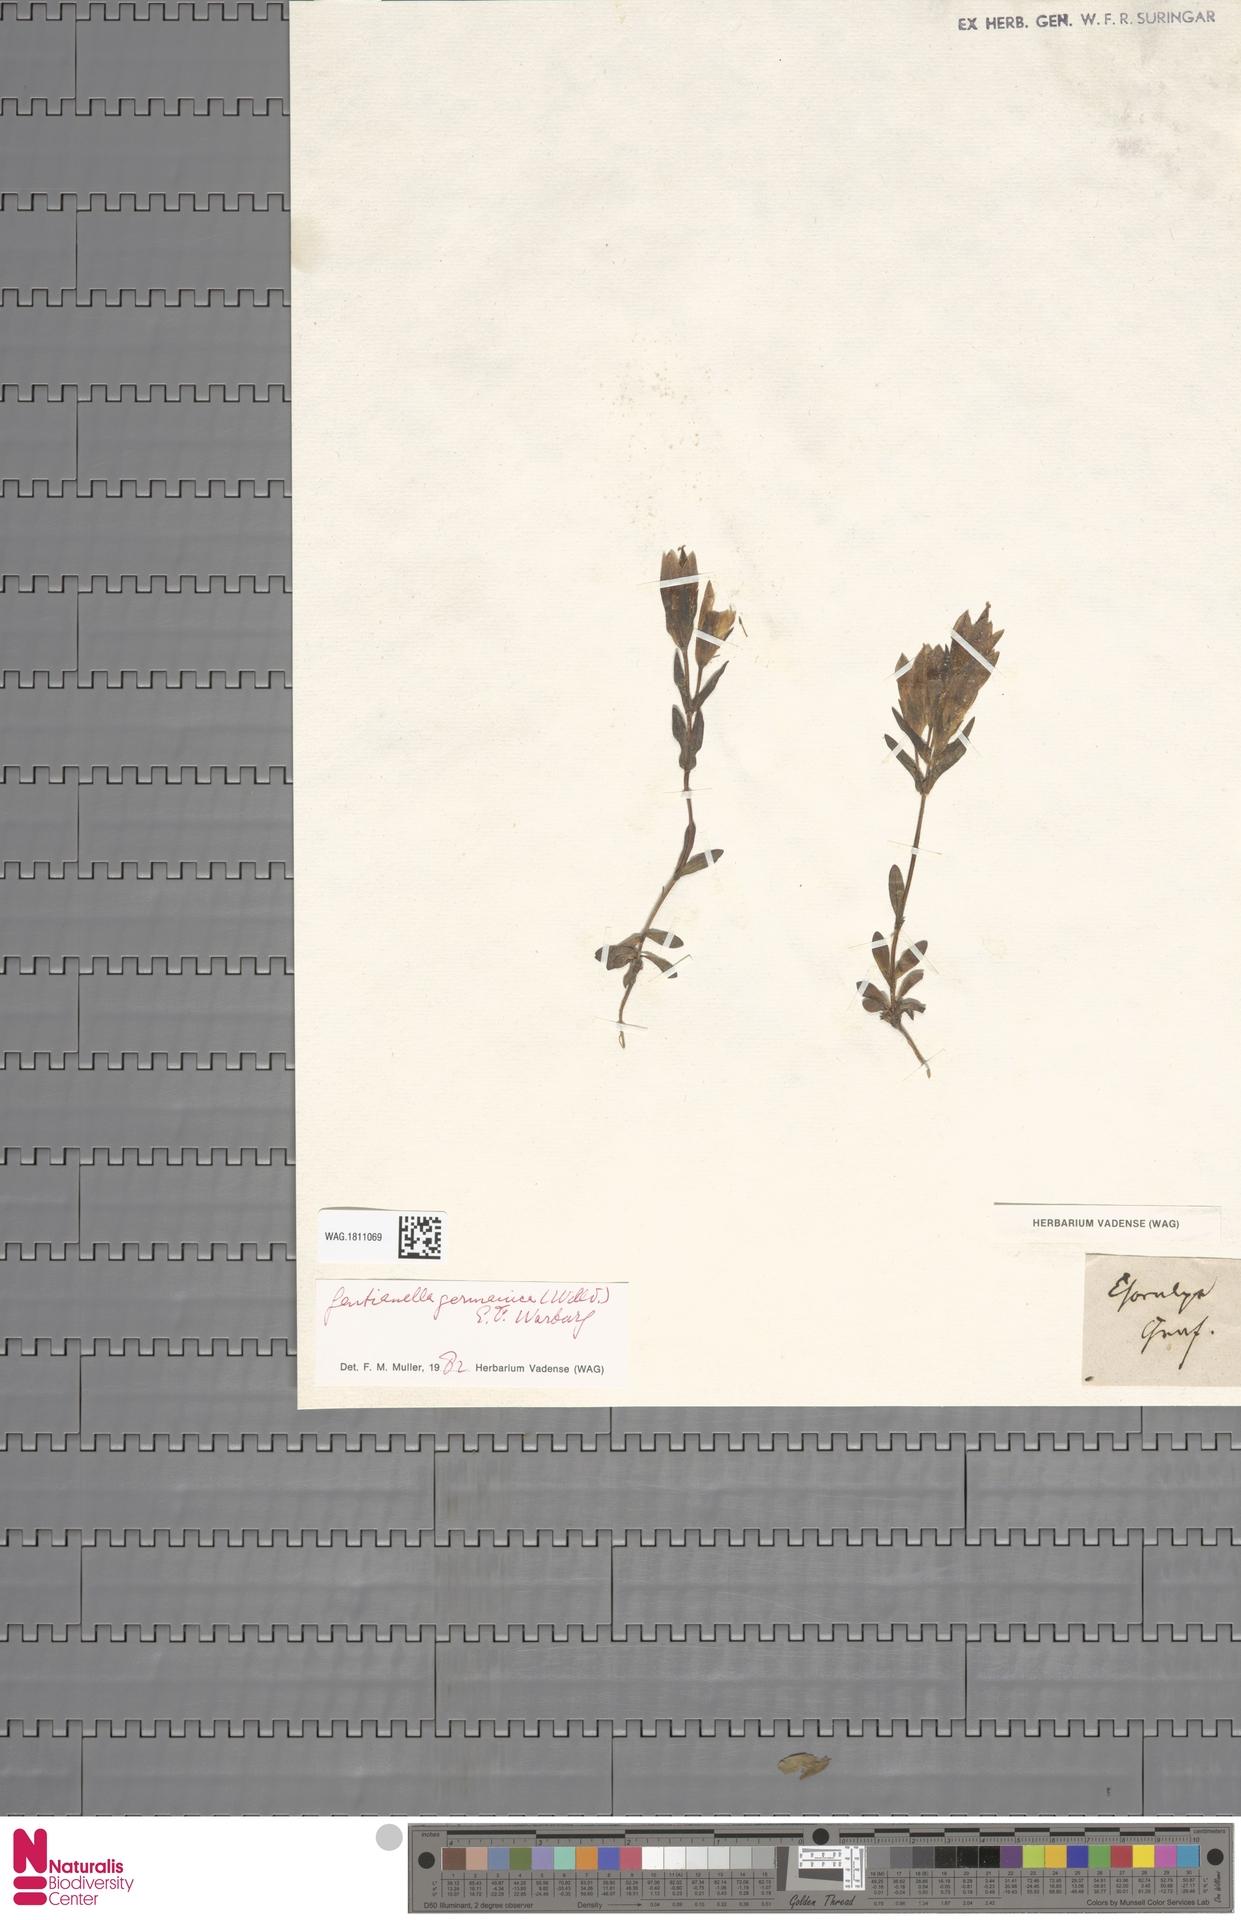 WAG.1811069   Gentianella germanica (Willd.) E.F.Warb.